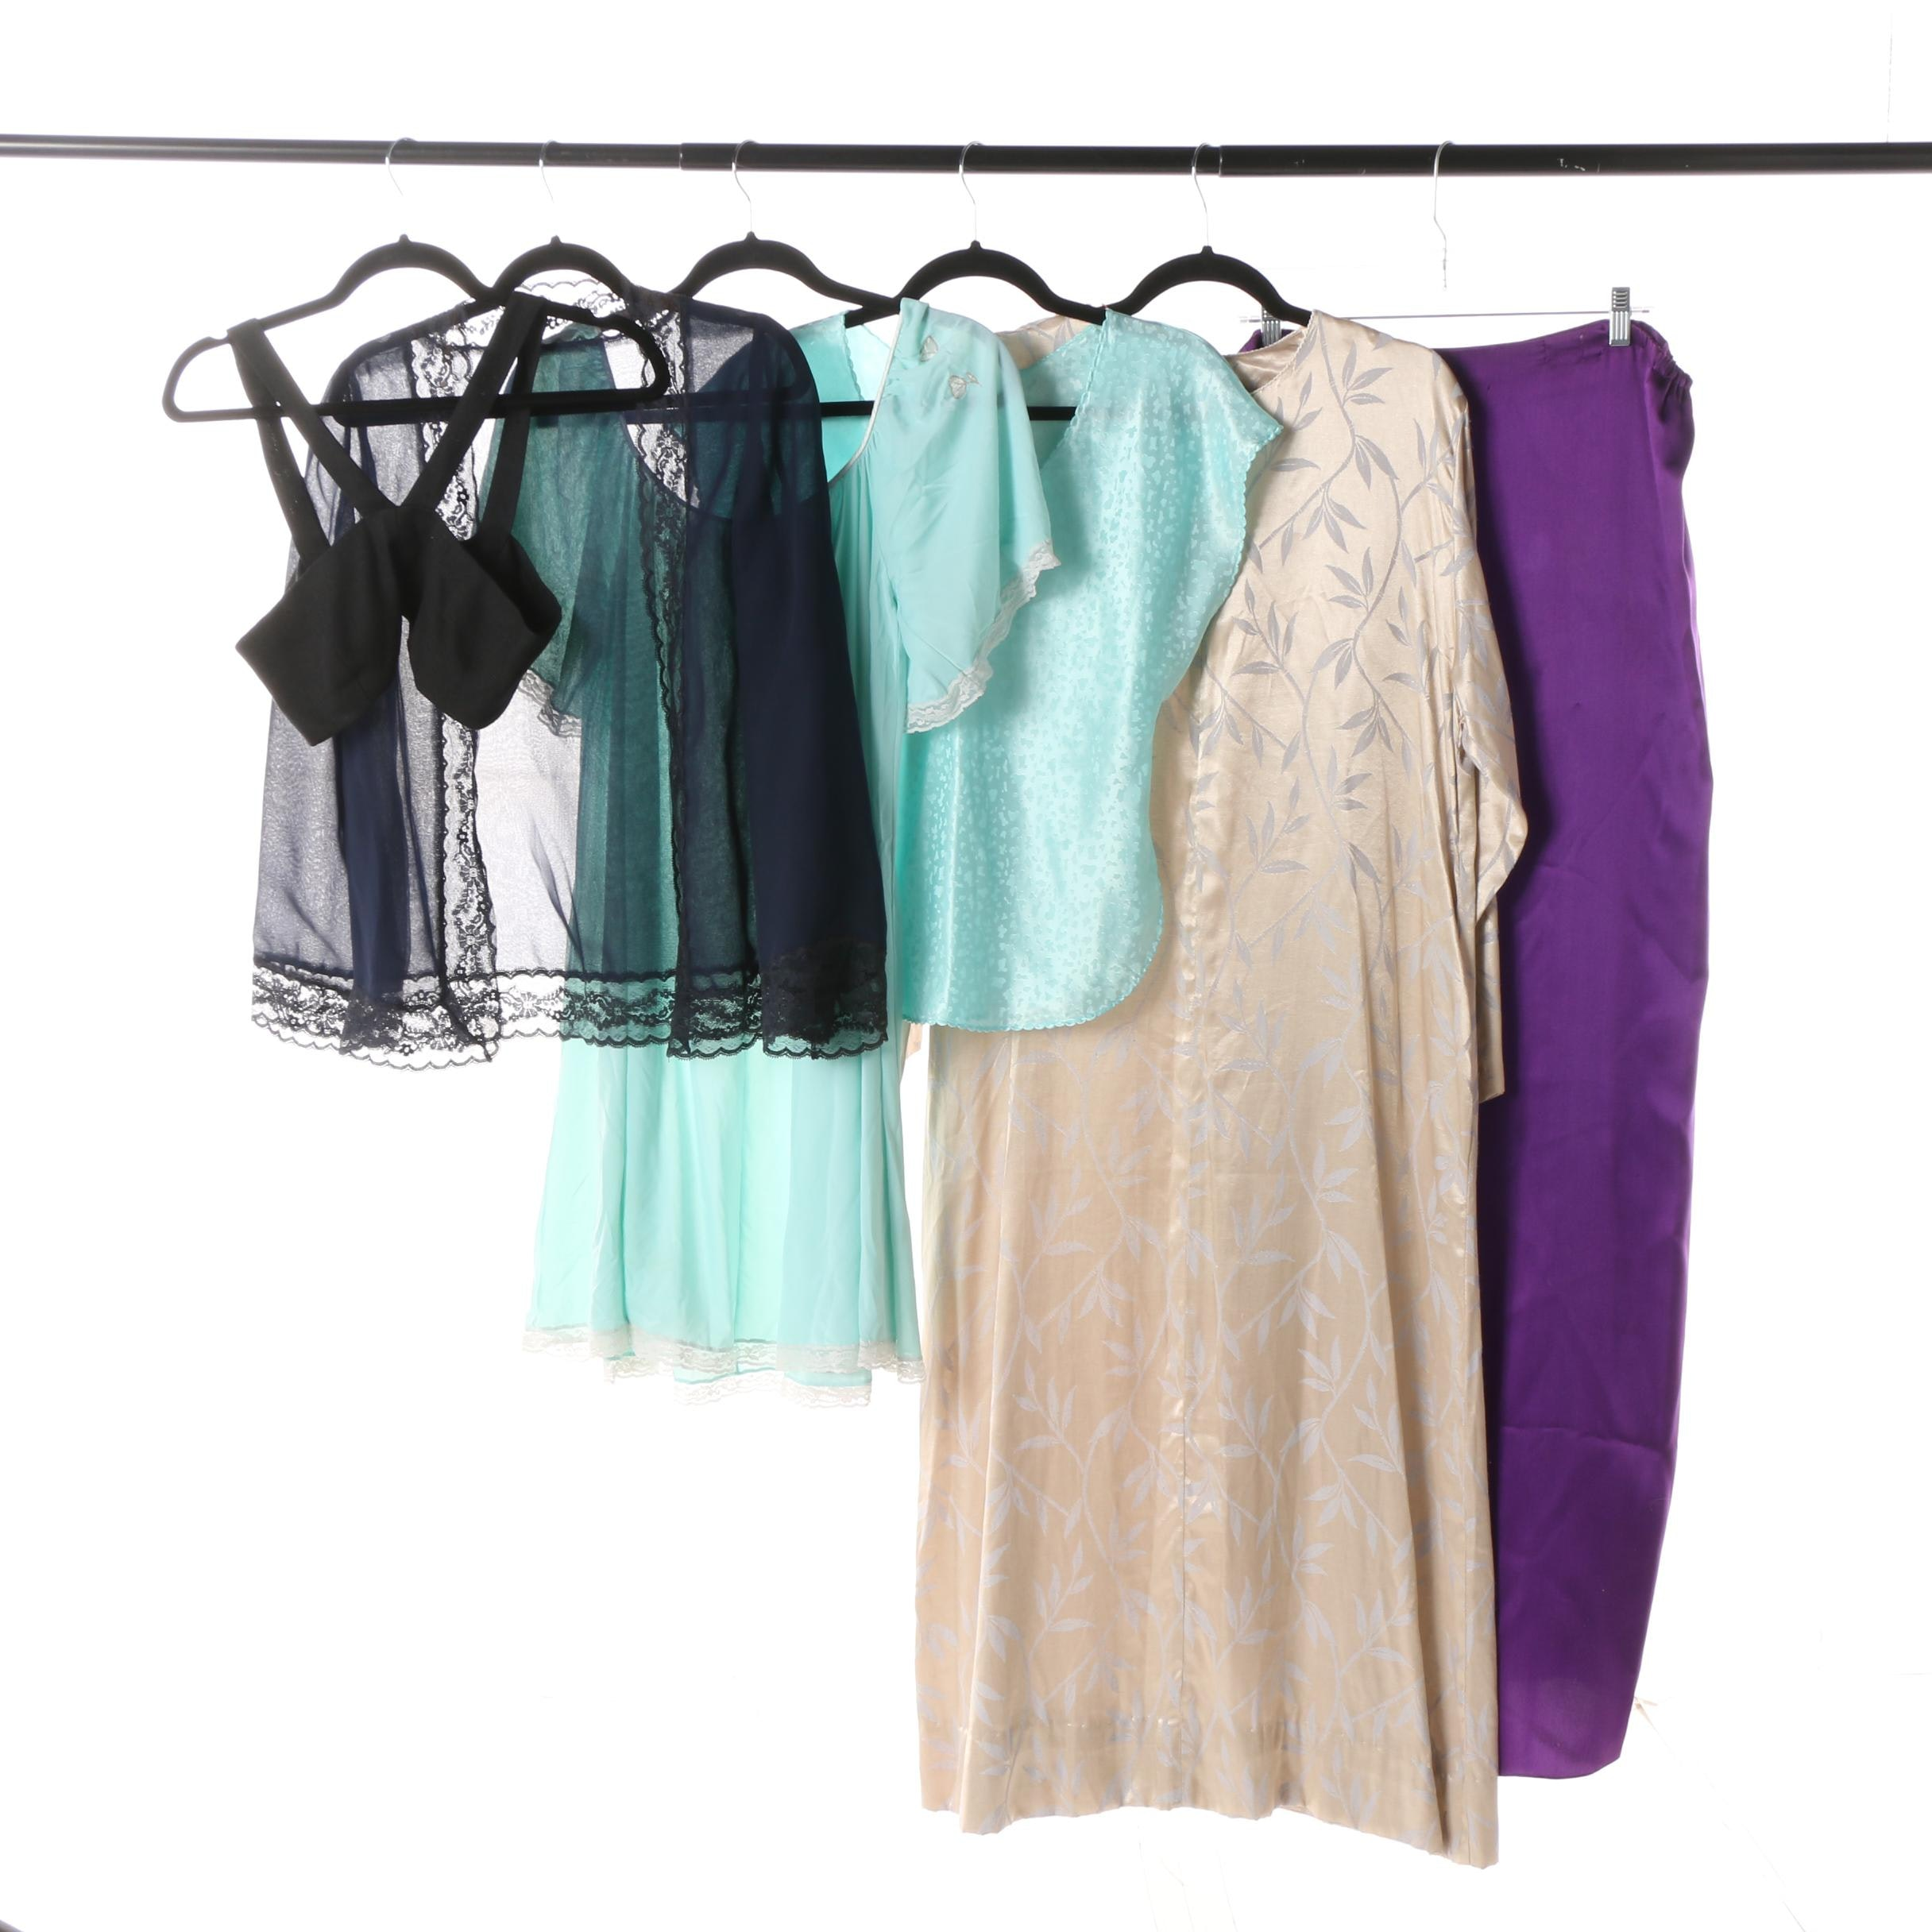 Women's Vintage Sleepwear including Ruth Norman and Ralph Montenero